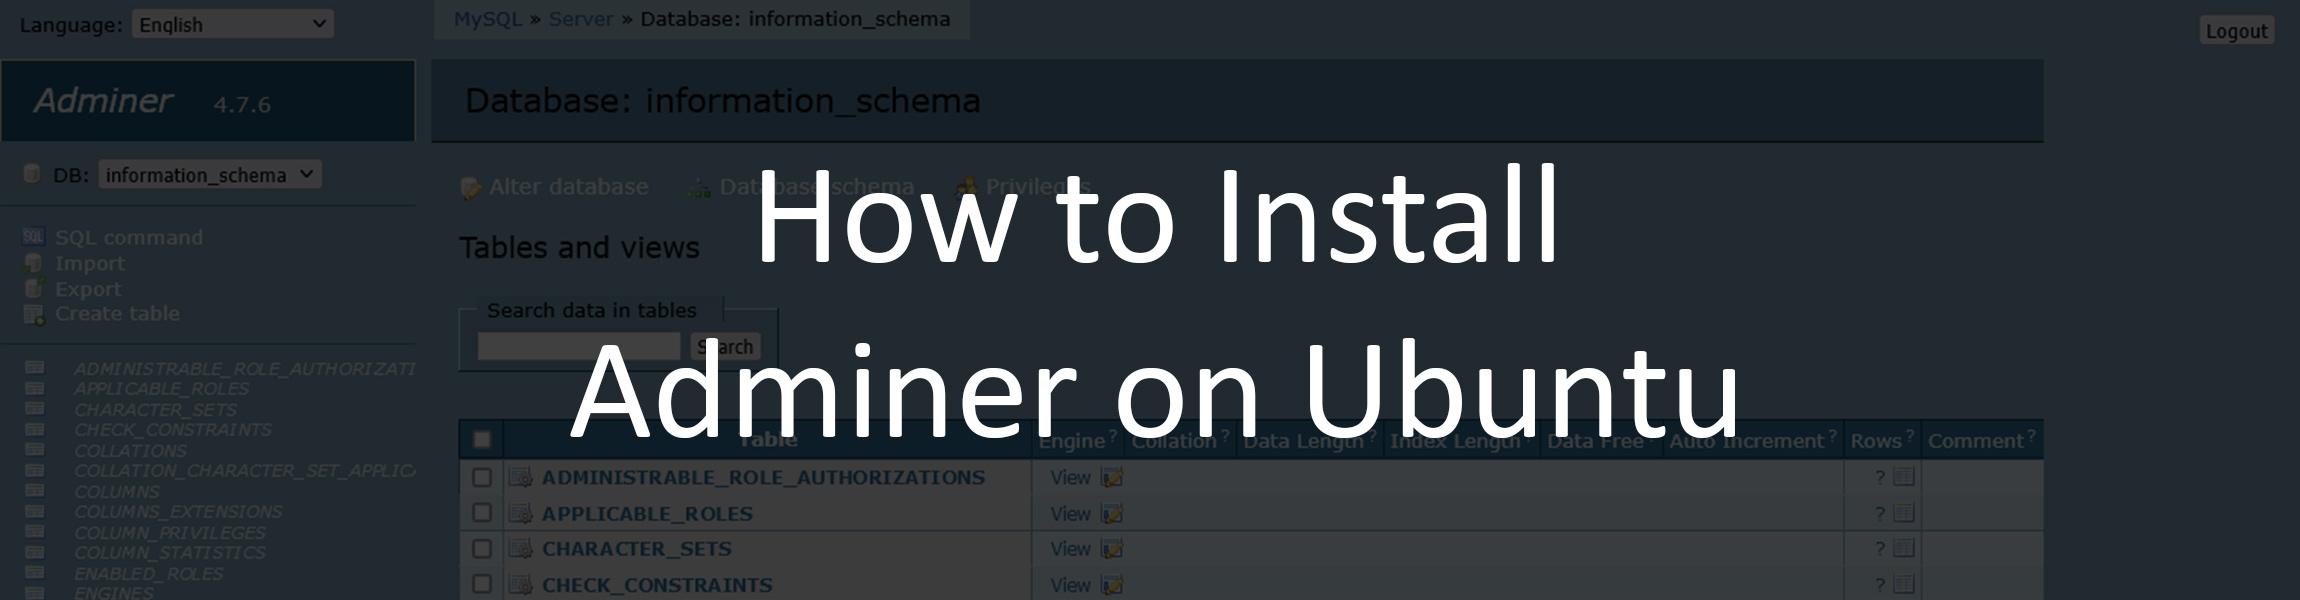 phpMyAdmin Alternative: How to Install and Use Adminer on Ubuntu